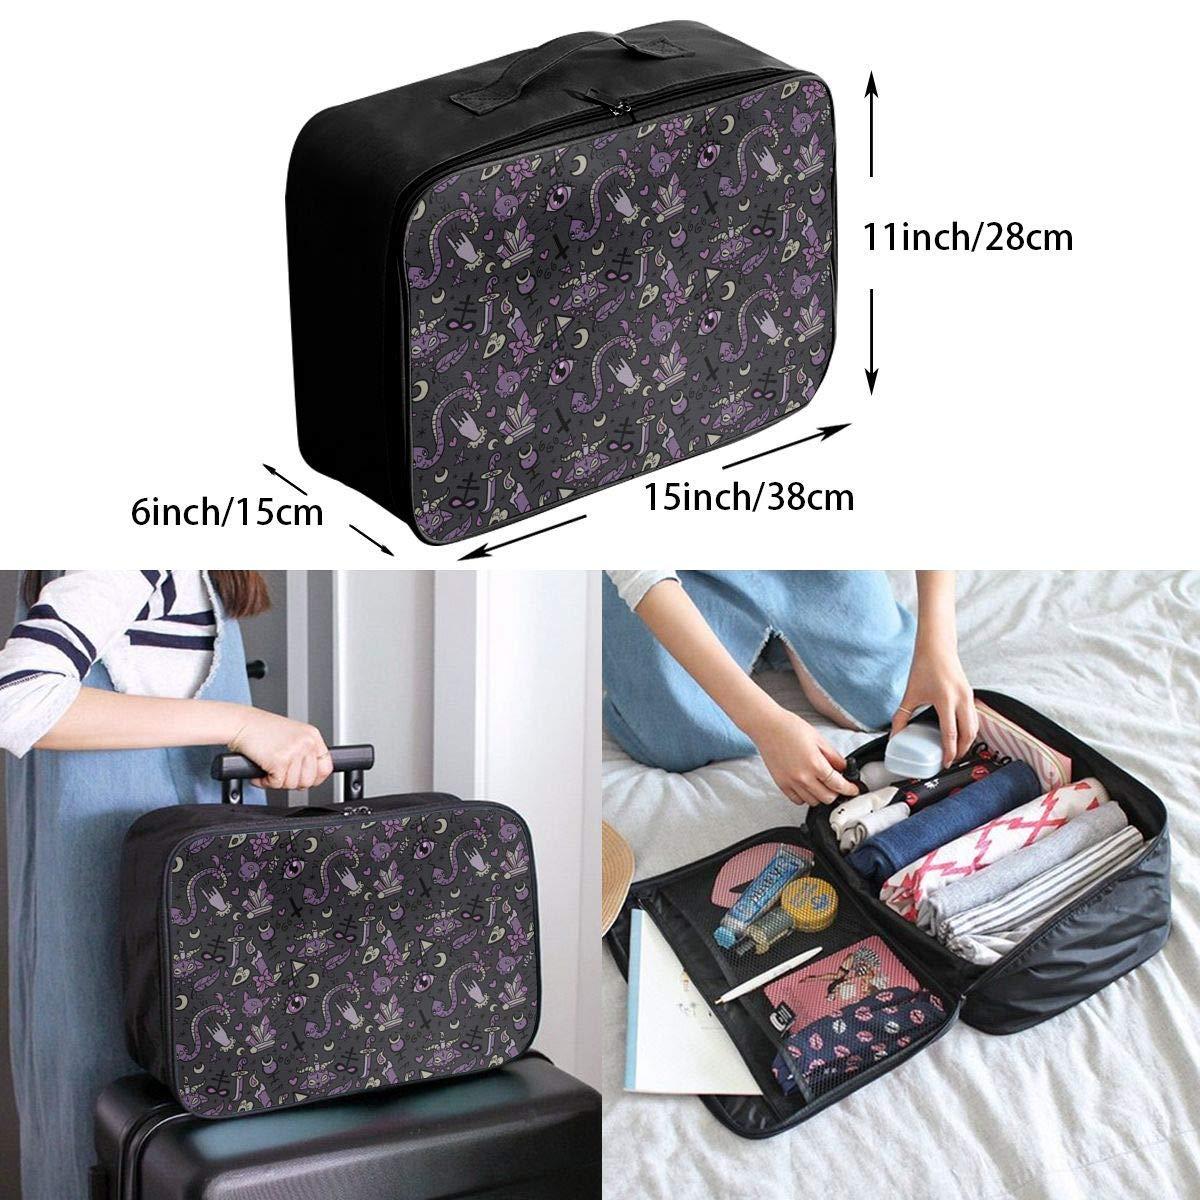 JTRVW Luggage Bags for Travel Purple Black Goth Spooky Travel Duffel Bag Waterproof Fashion Lightweight Large Capacity Portable Duffel Bag for Men /& Women